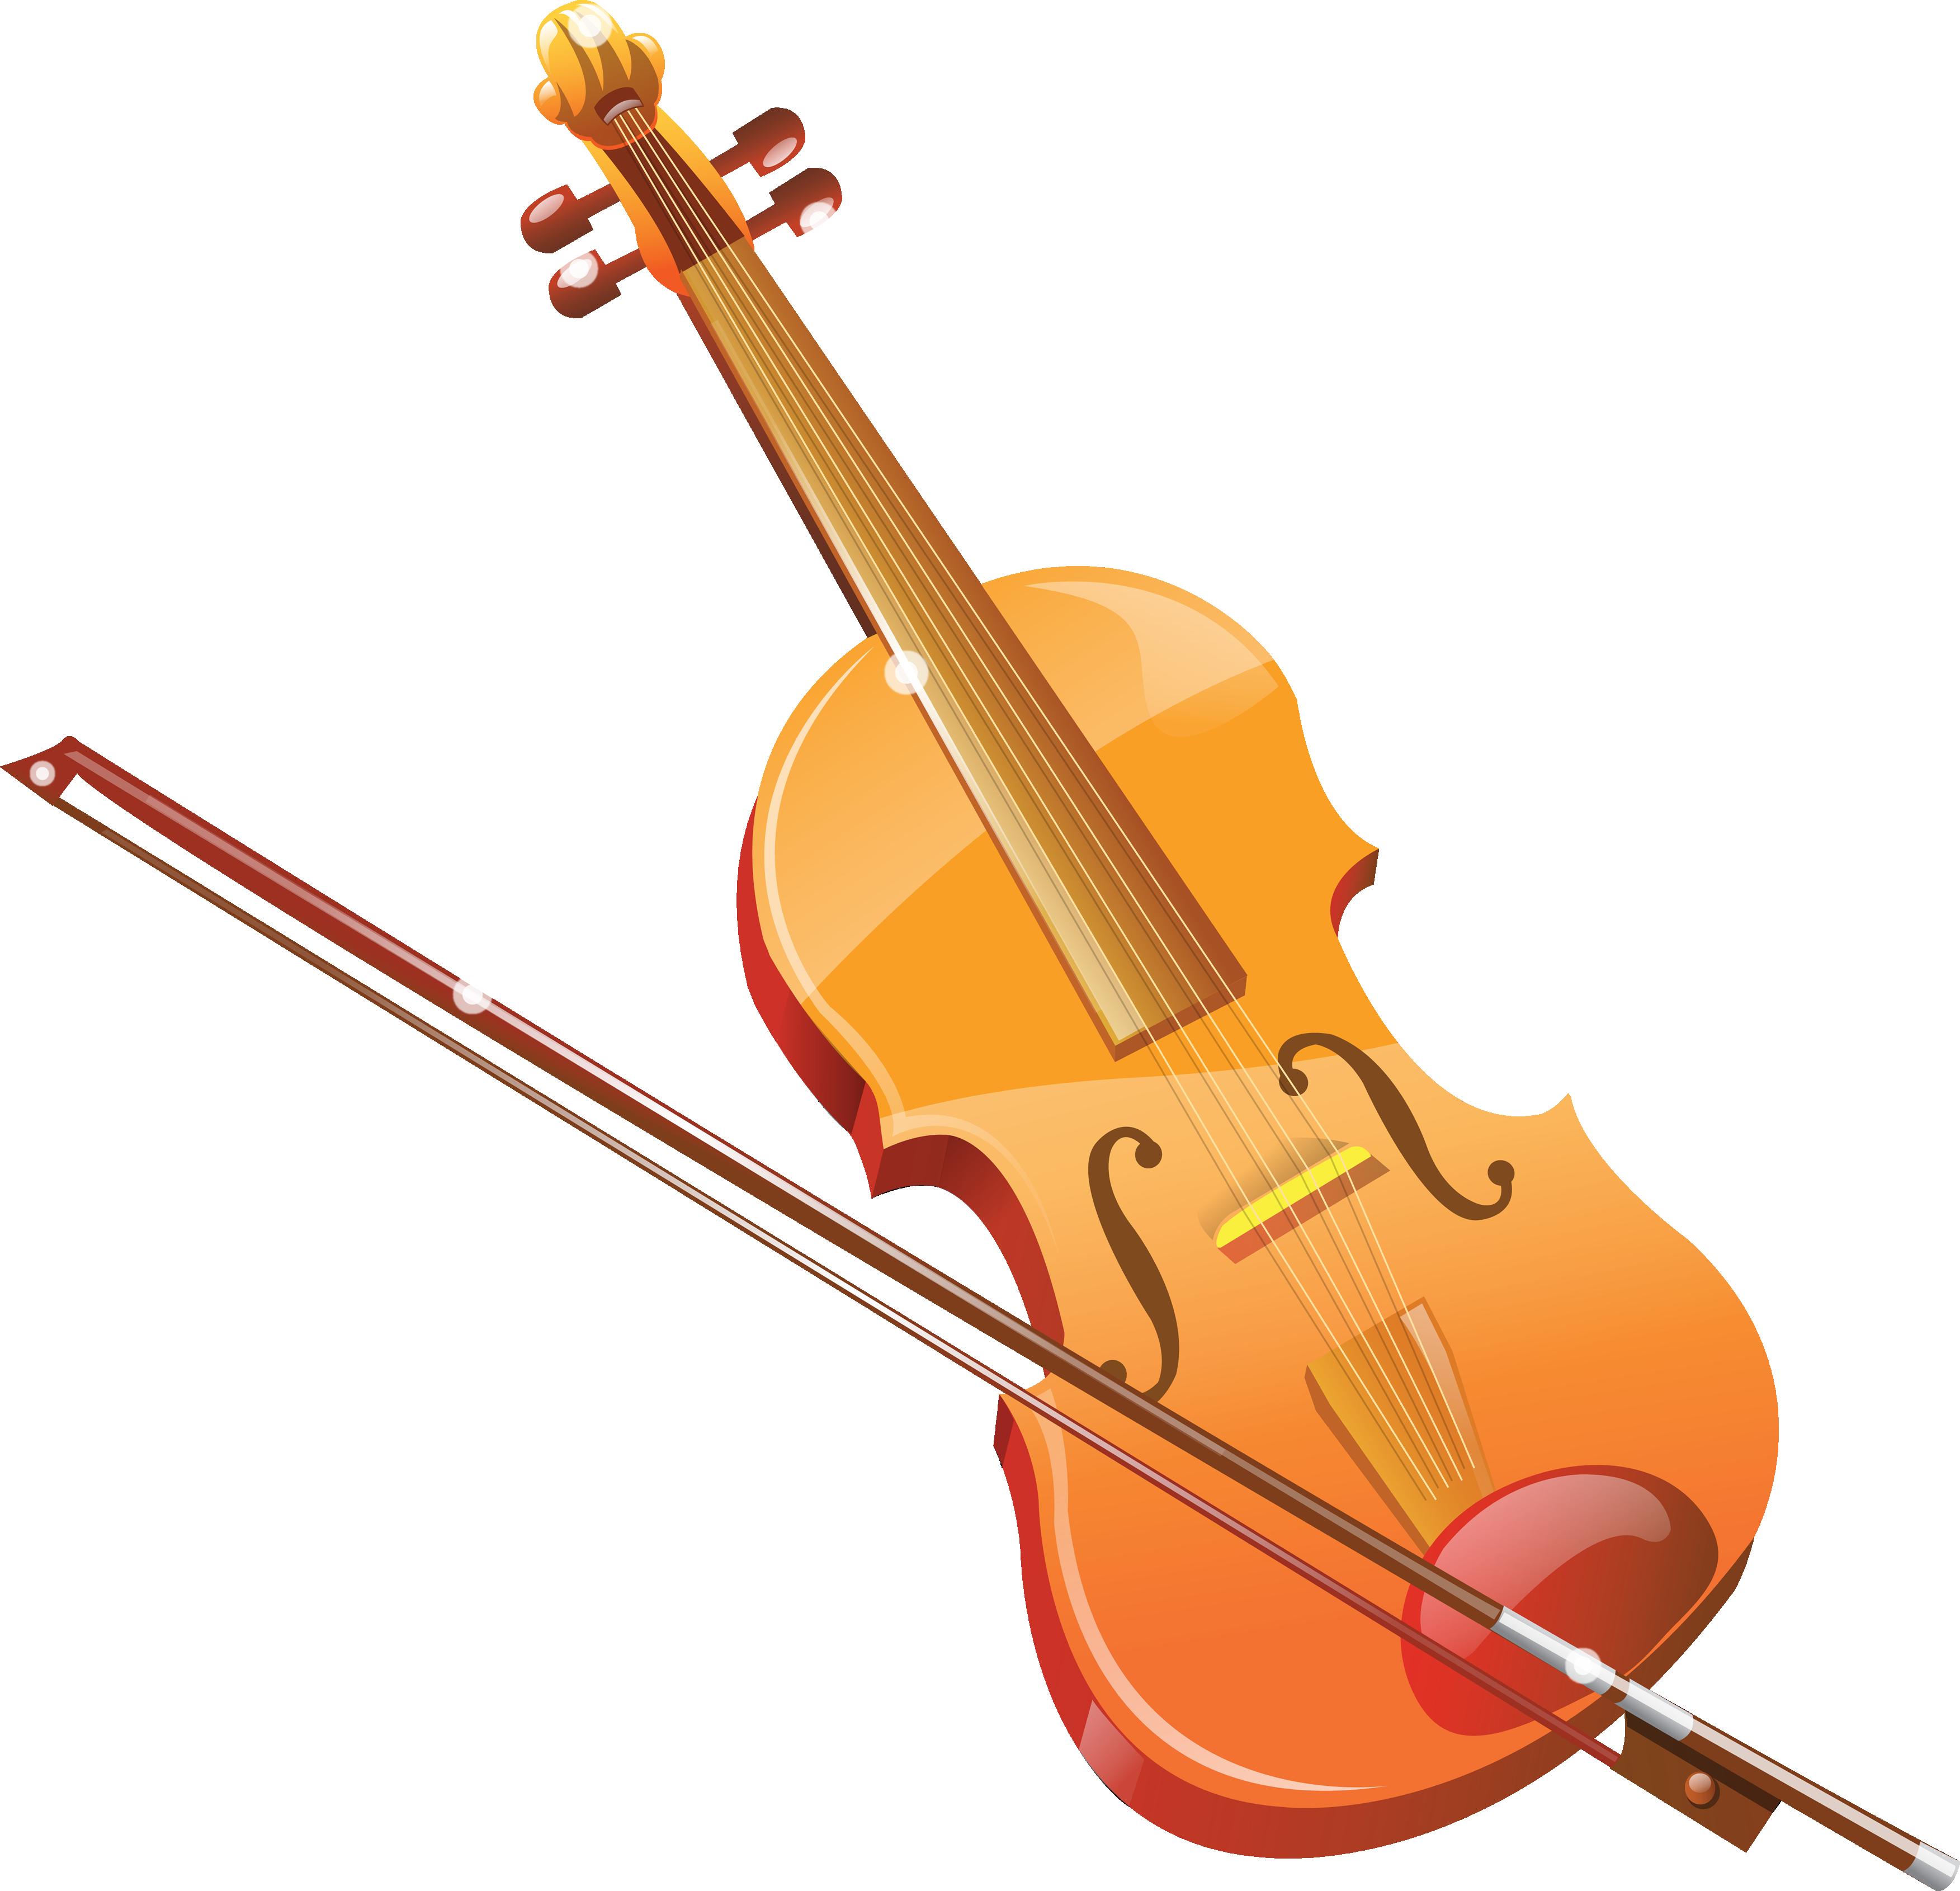 Clipart guitar violin. Bow png image purepng